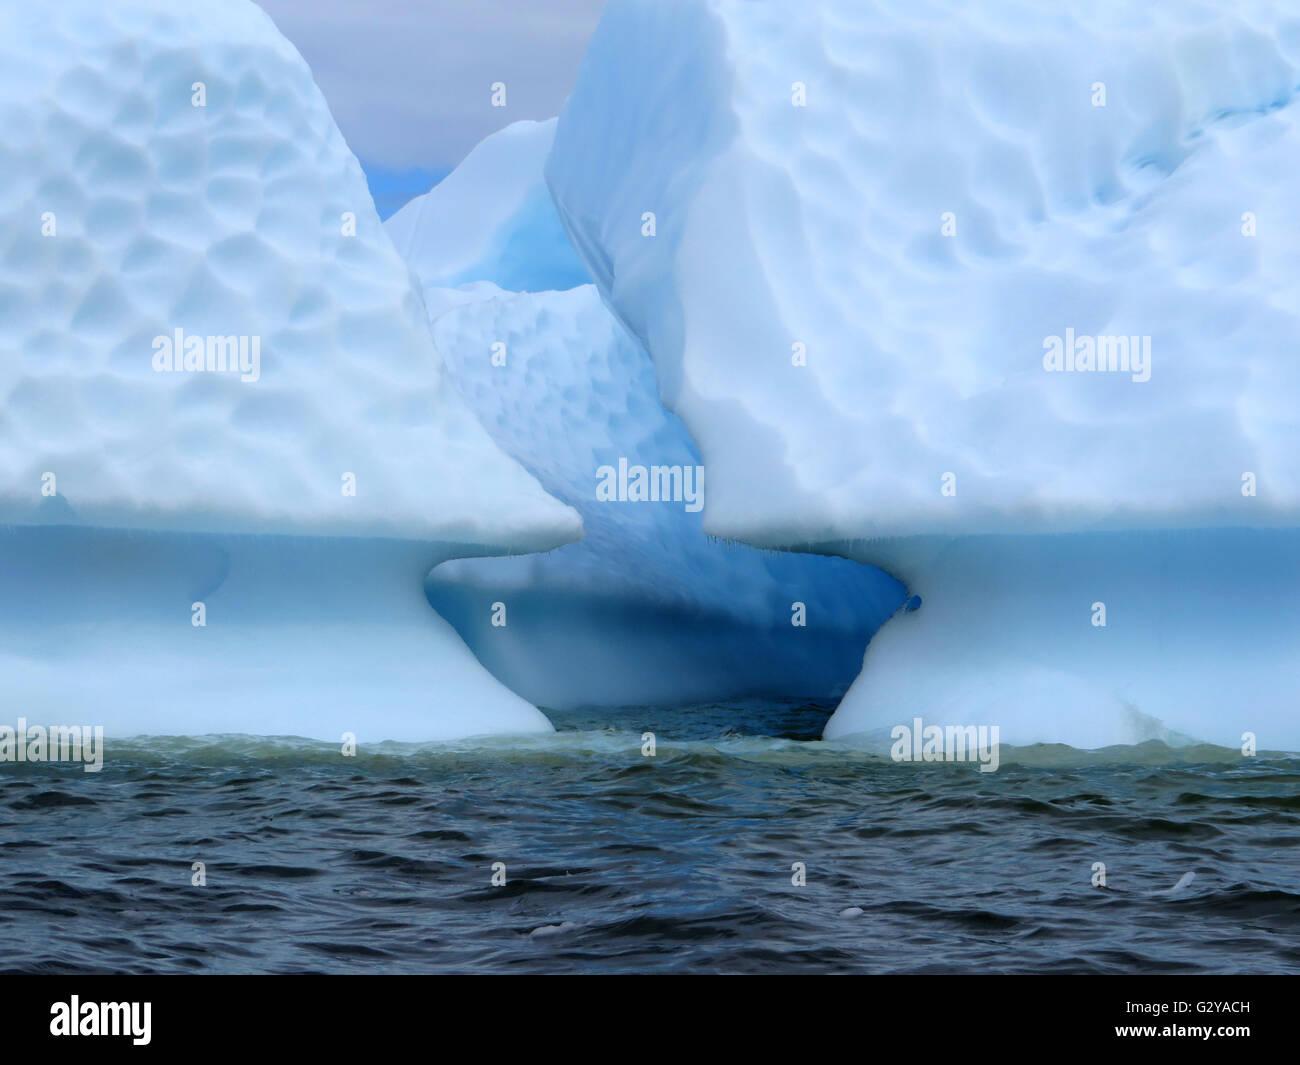 Icebergs in Antarctica - Stock Image